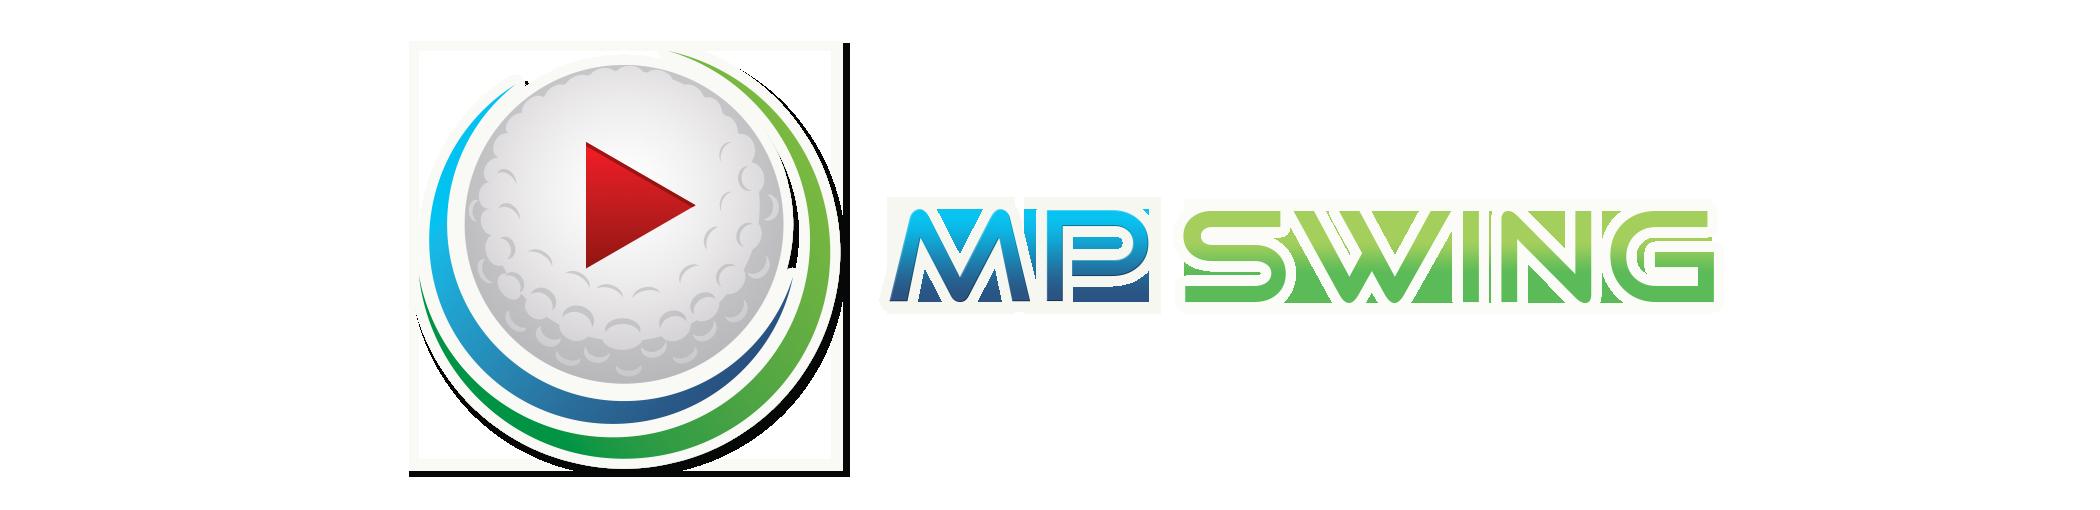 MP Swing